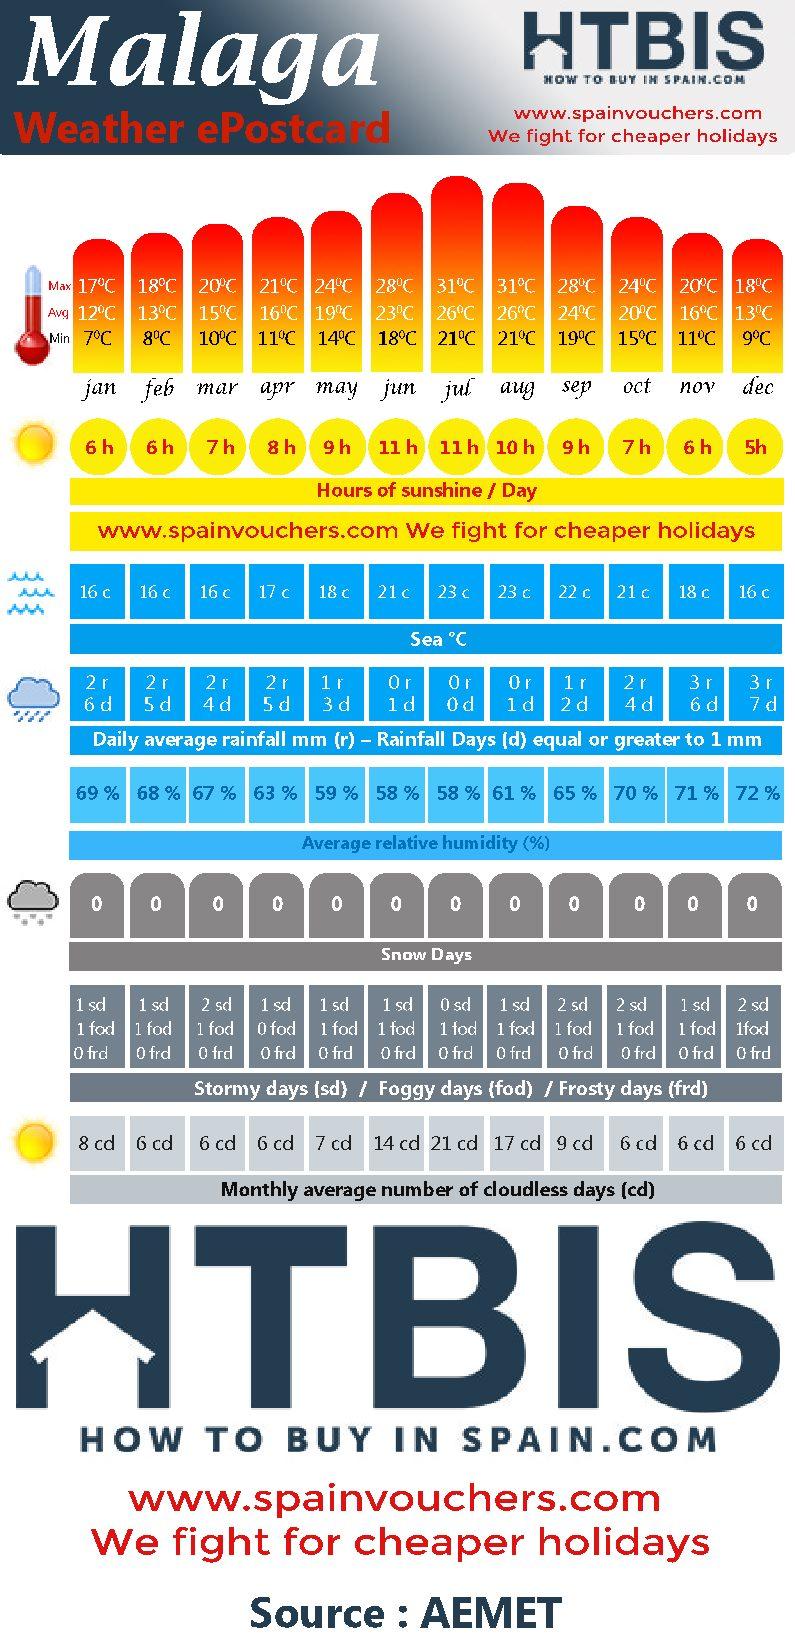 Malaga, Weather statistic Infographic